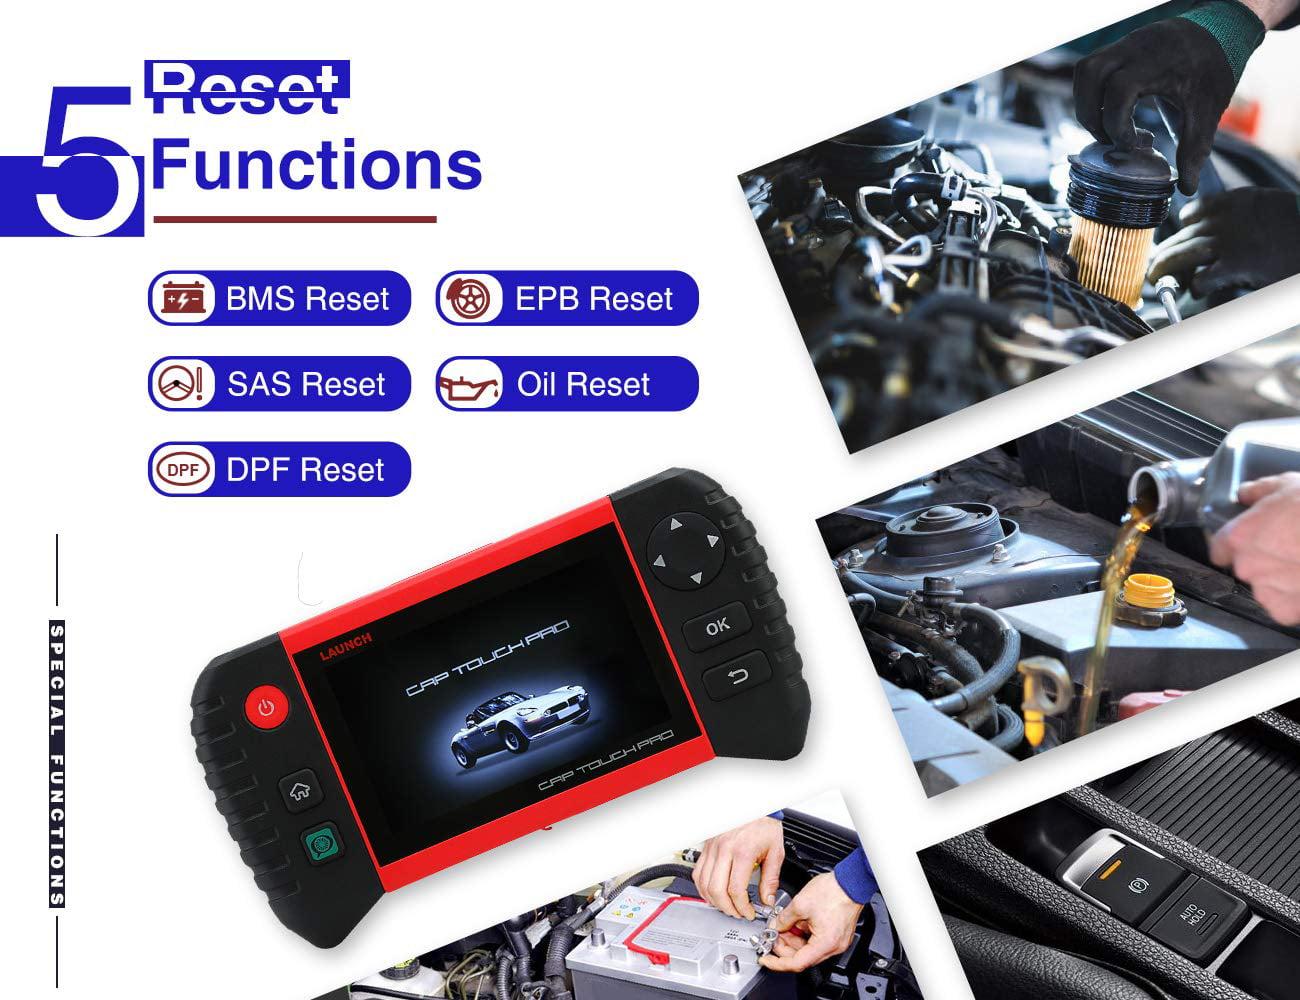 Launch CRP Touch Pro 5 0